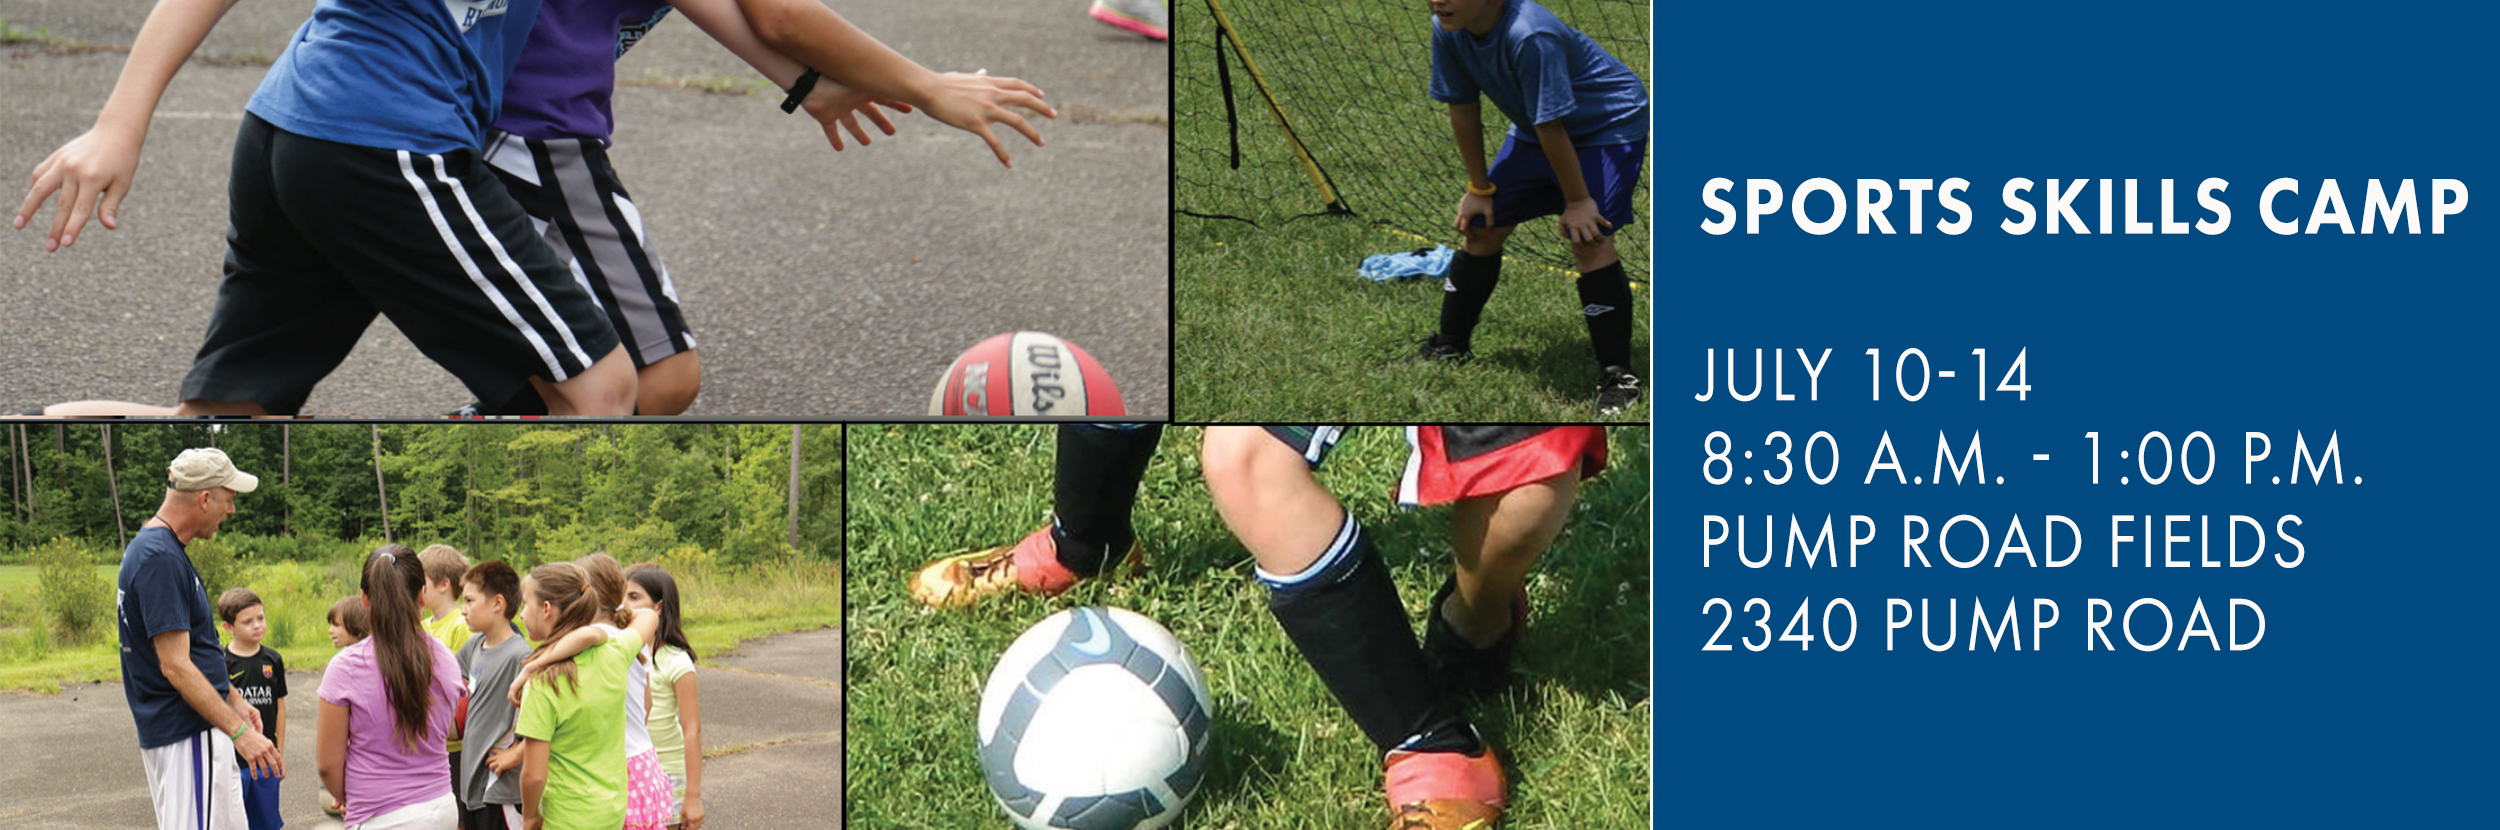 Sports Skills Banner.jpg